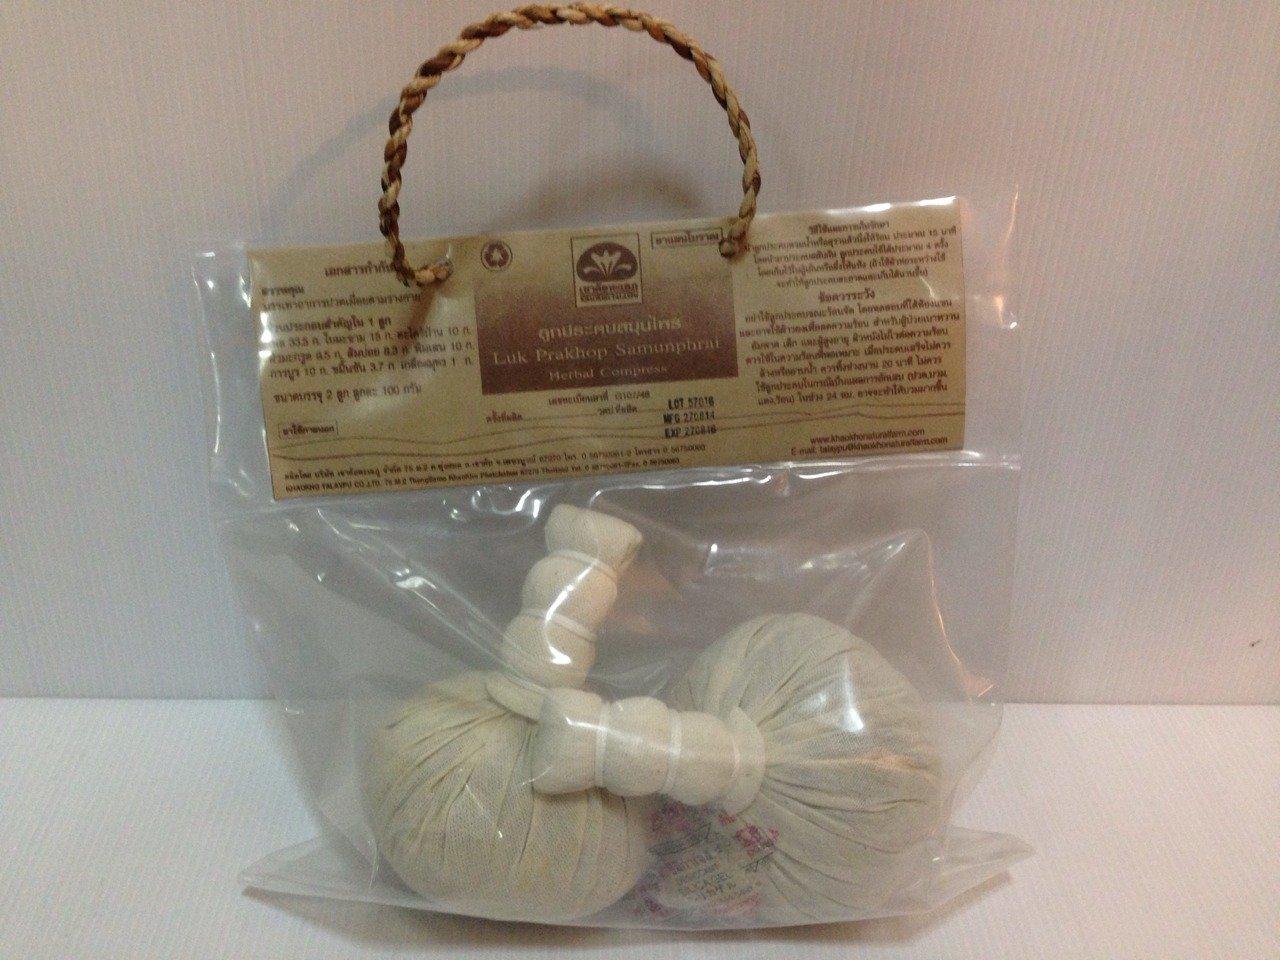 Amazing 2x Thai Herbal Compress Massage Pack, Spa, Herbal Ball Thailand Thailand